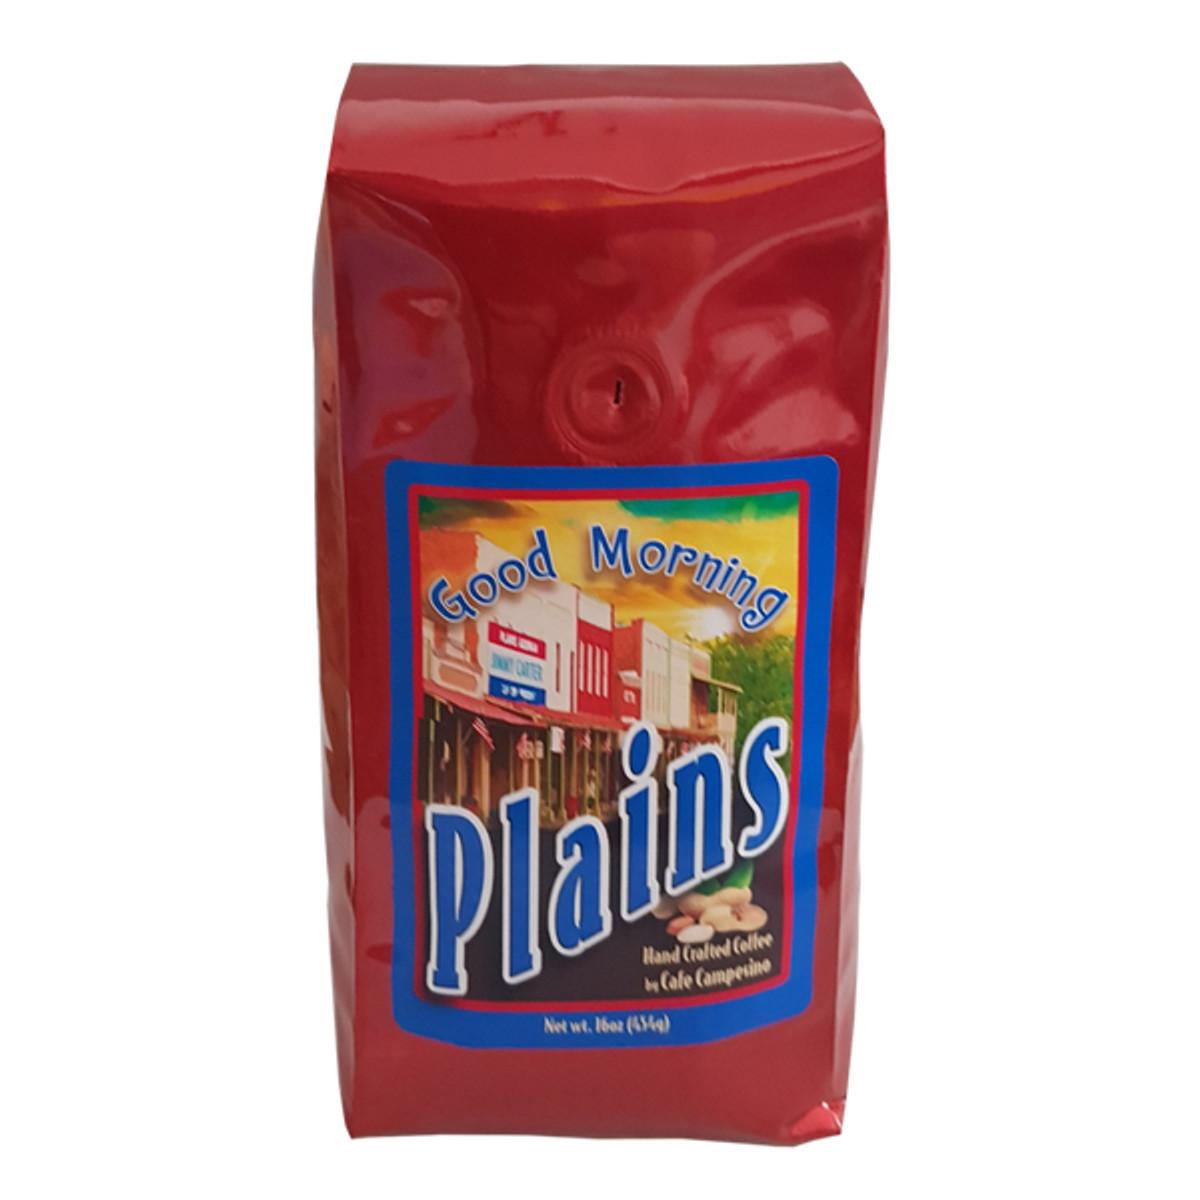 Good Morning Plains Viennese Roast Coffee